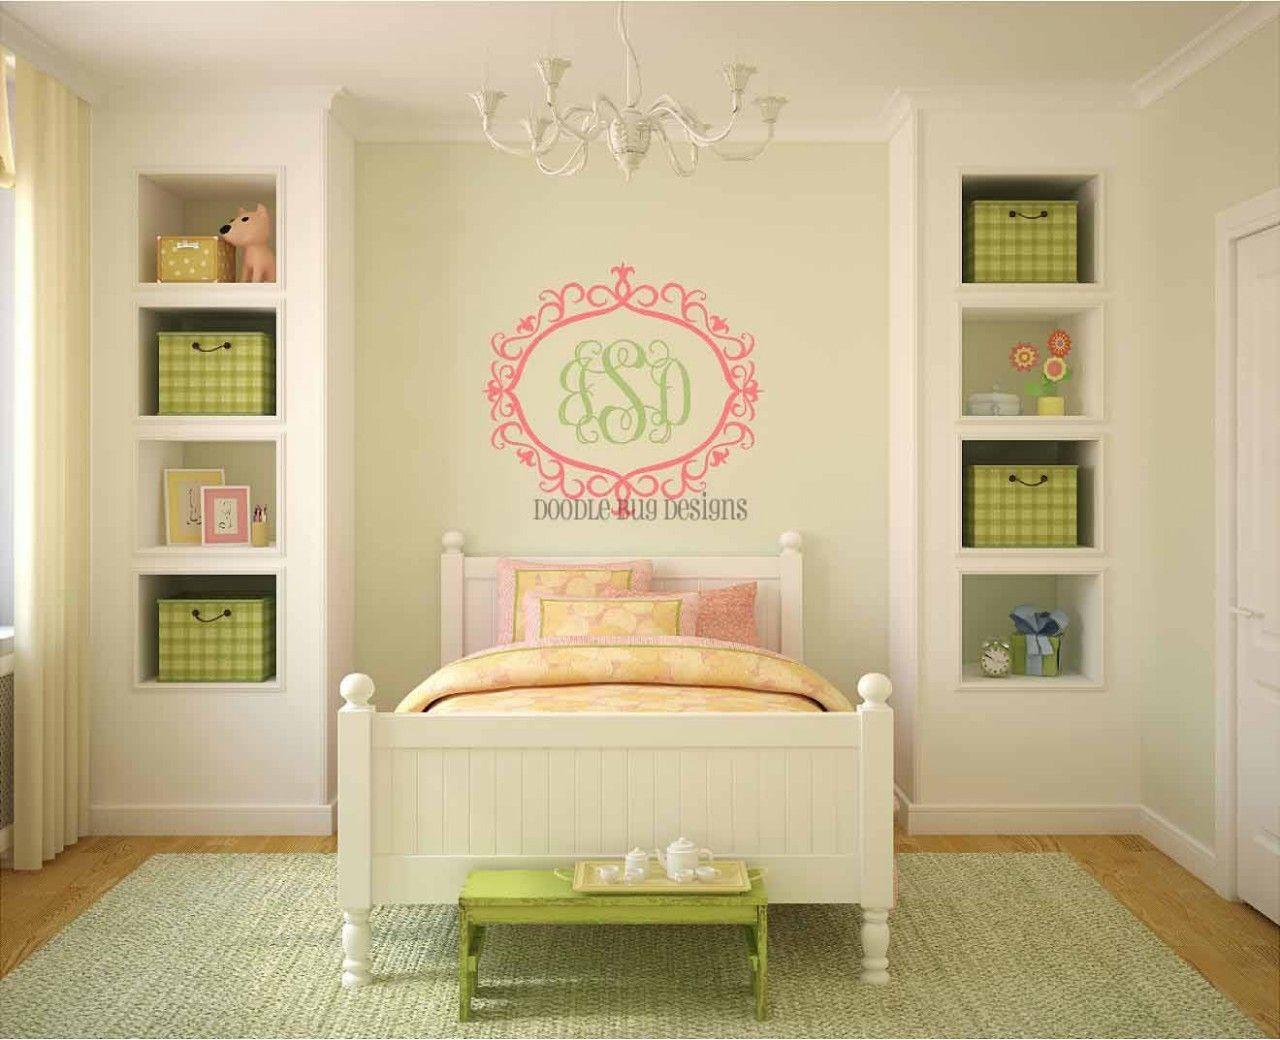 Big girl room wall monogram for audrey pinterest big girl rooms